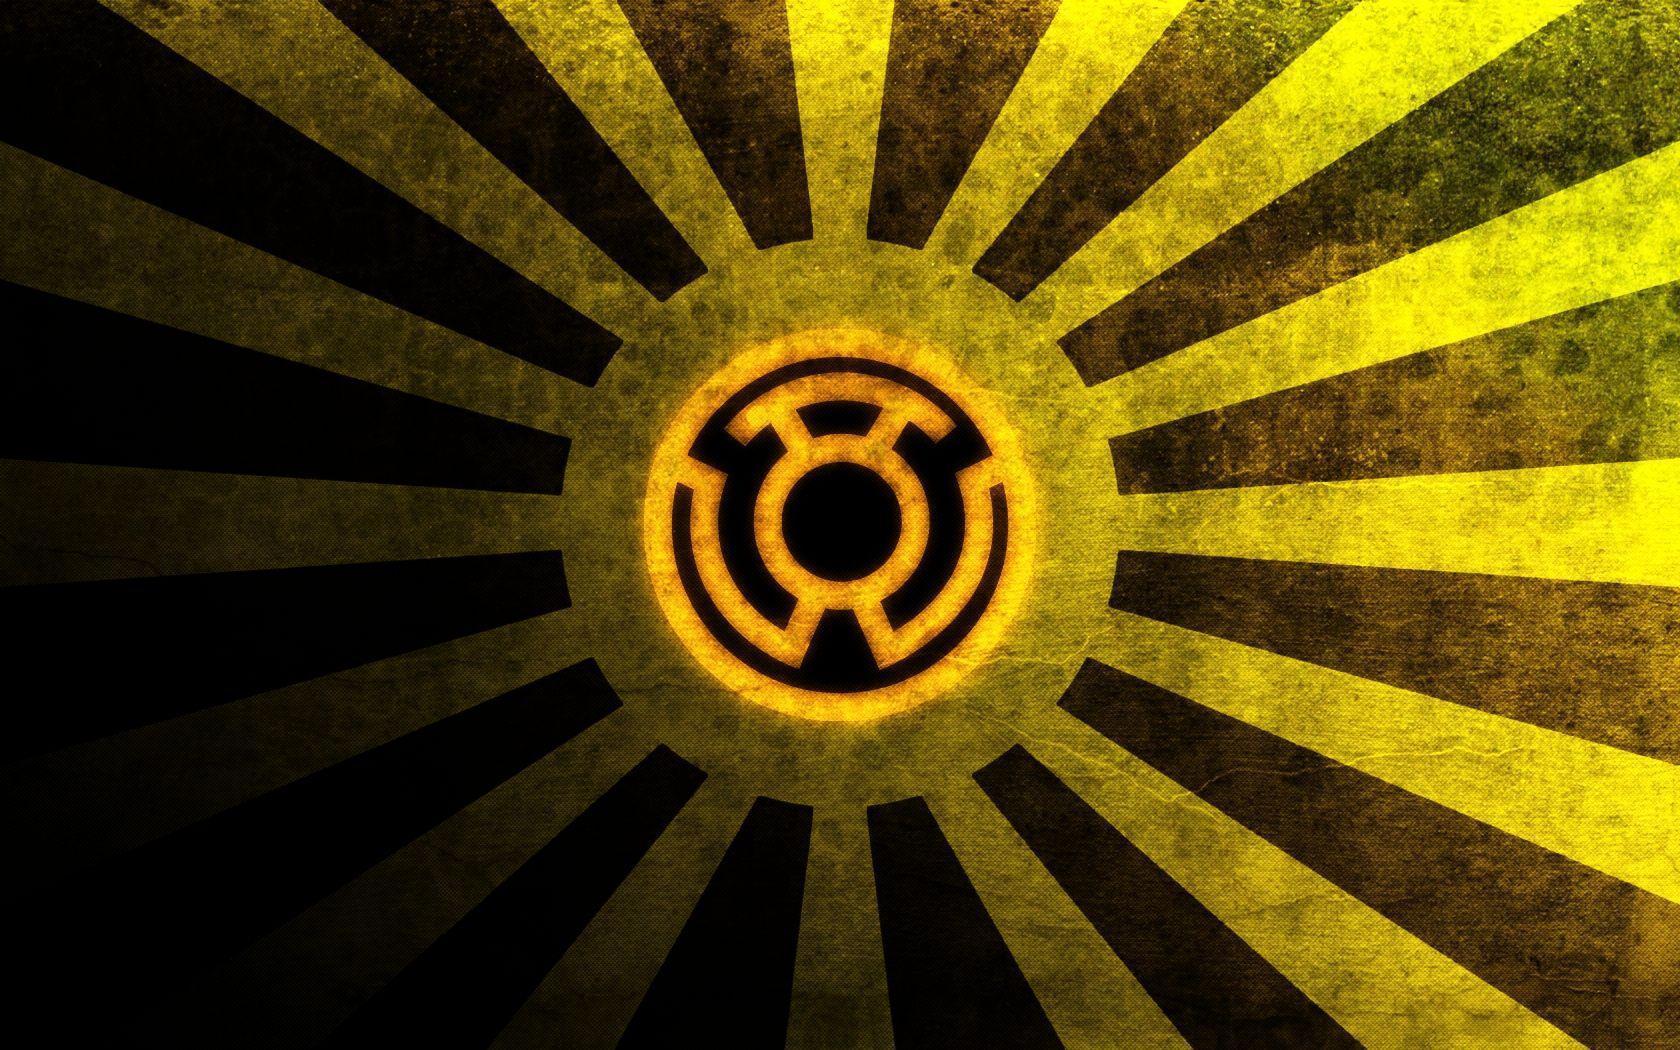 Sinestro Corps Wallpaper by LordShenlong.deviantart.com on ...